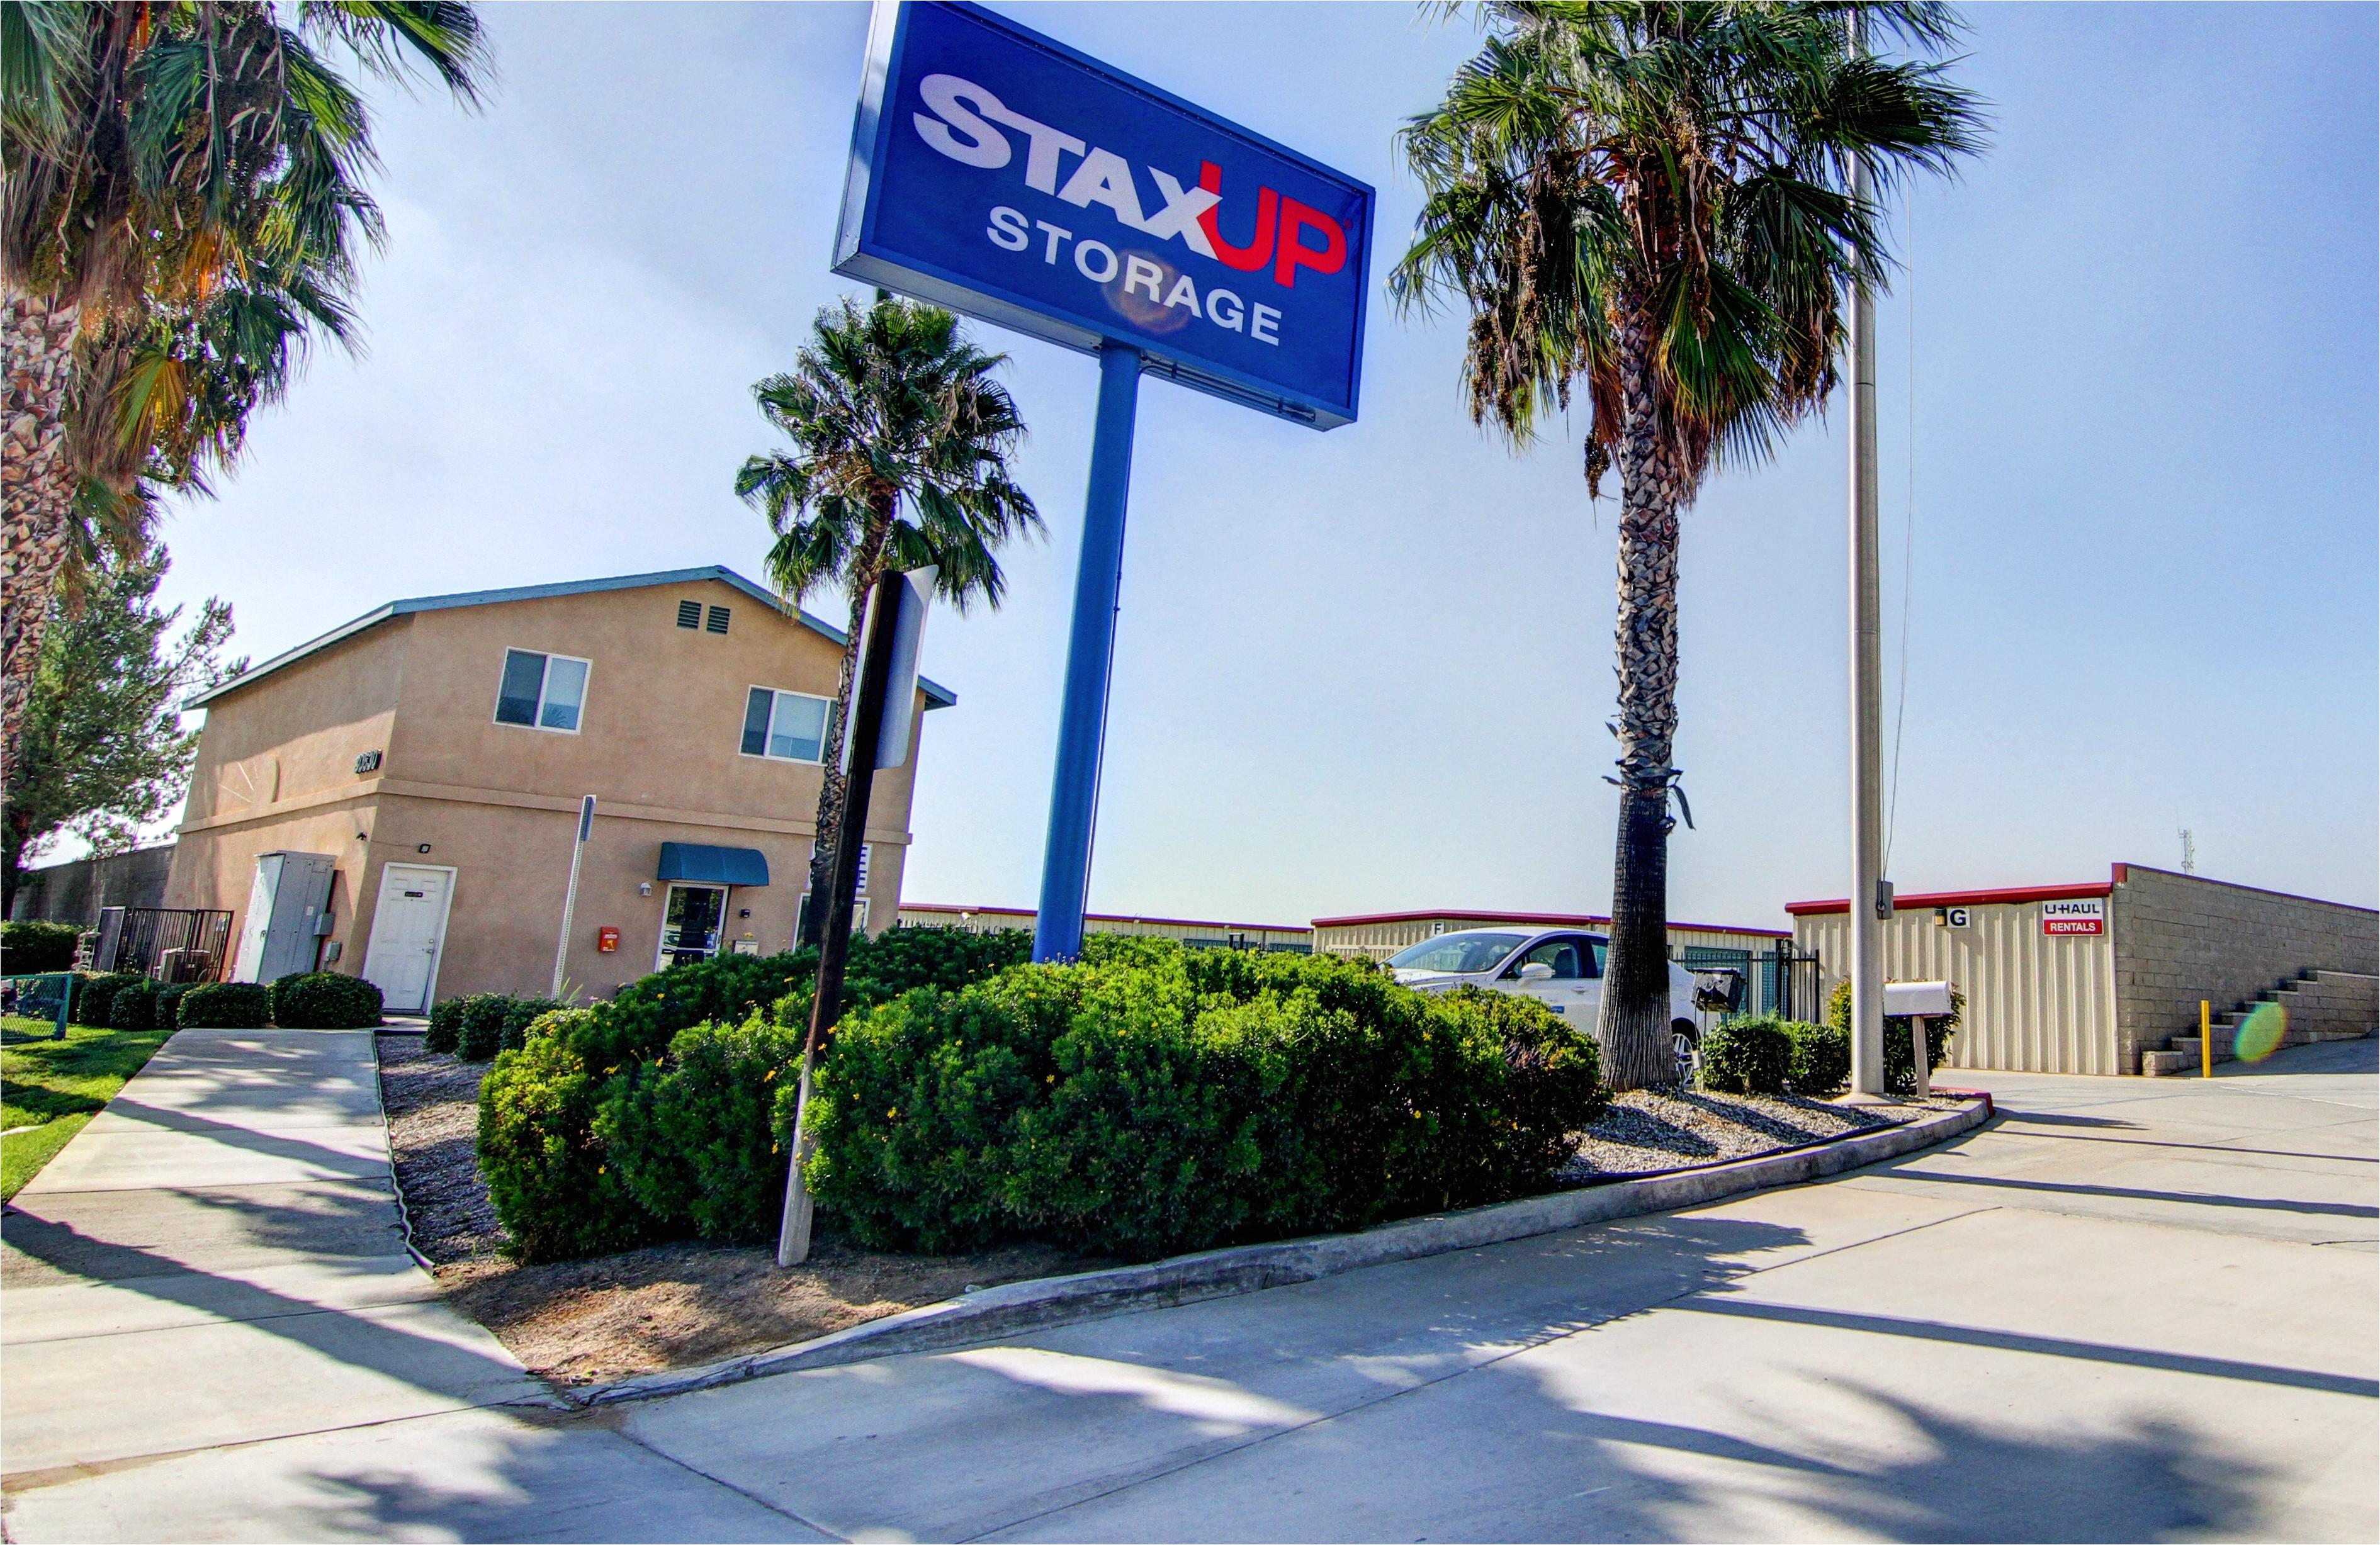 staxup storage homeland 30630 hwy 74 homeland ca storagefront com